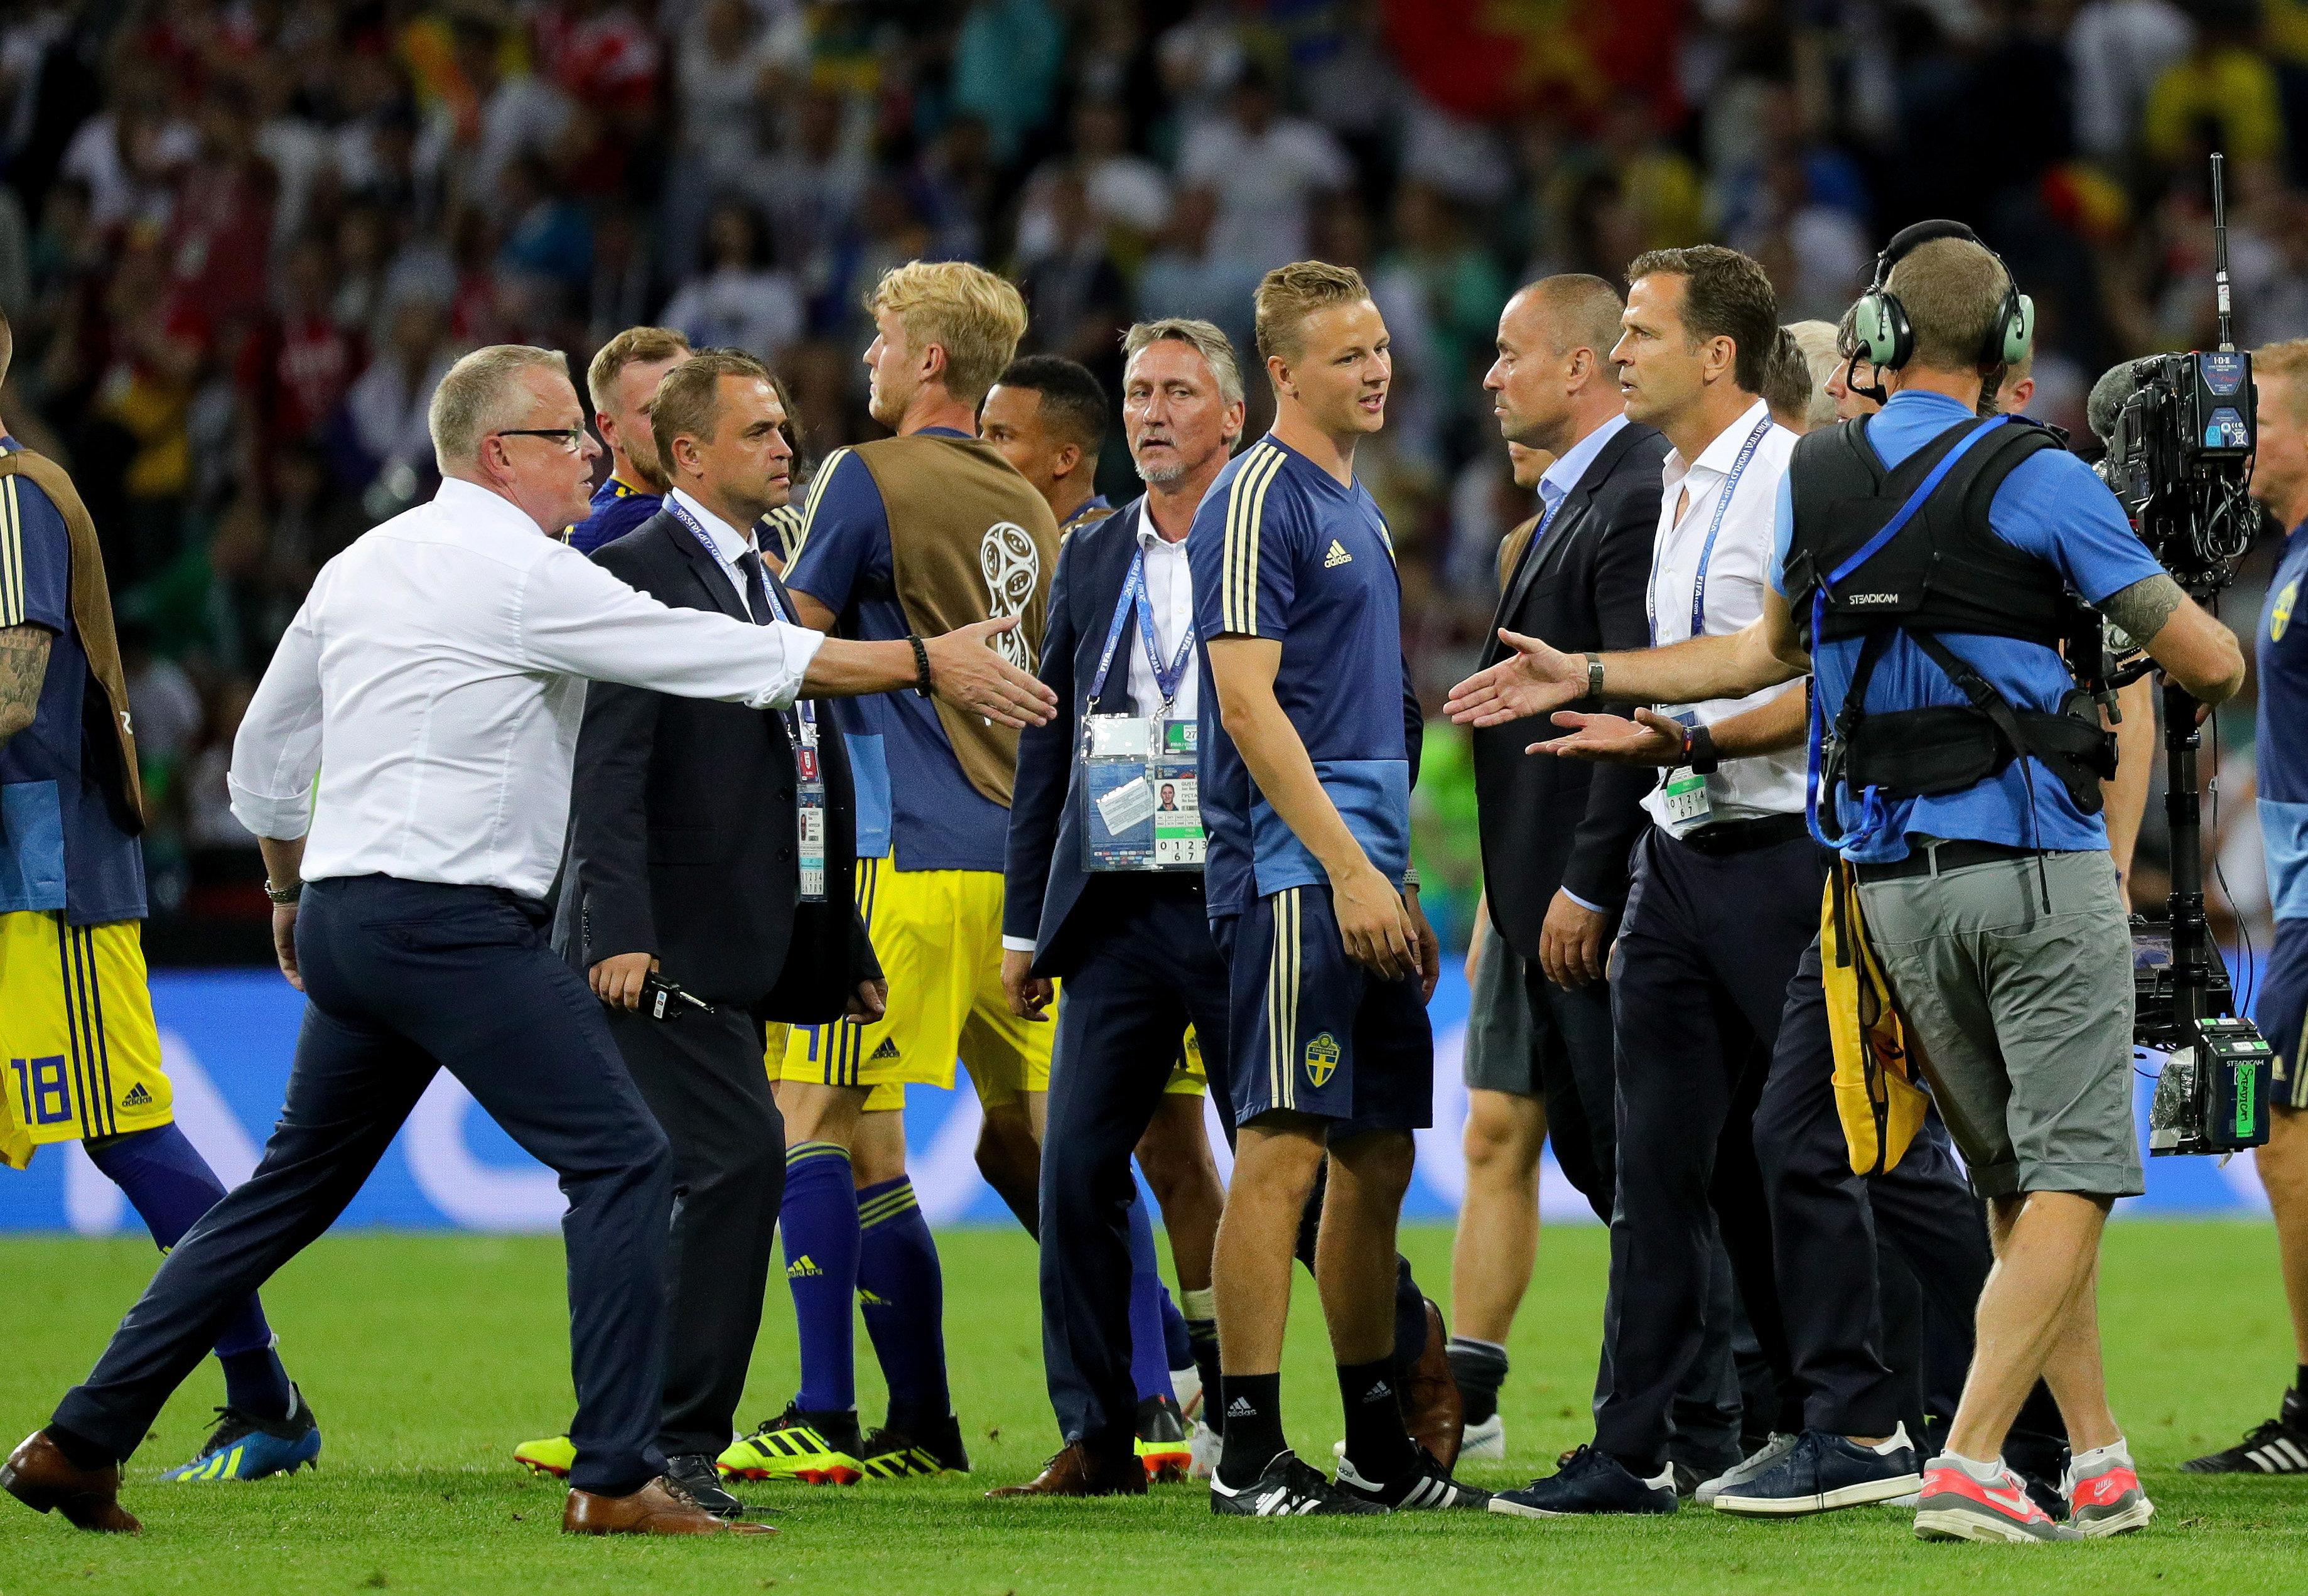 Hitzige Szenen nach Schweden-Spiel: Fifa ermittelt gegen